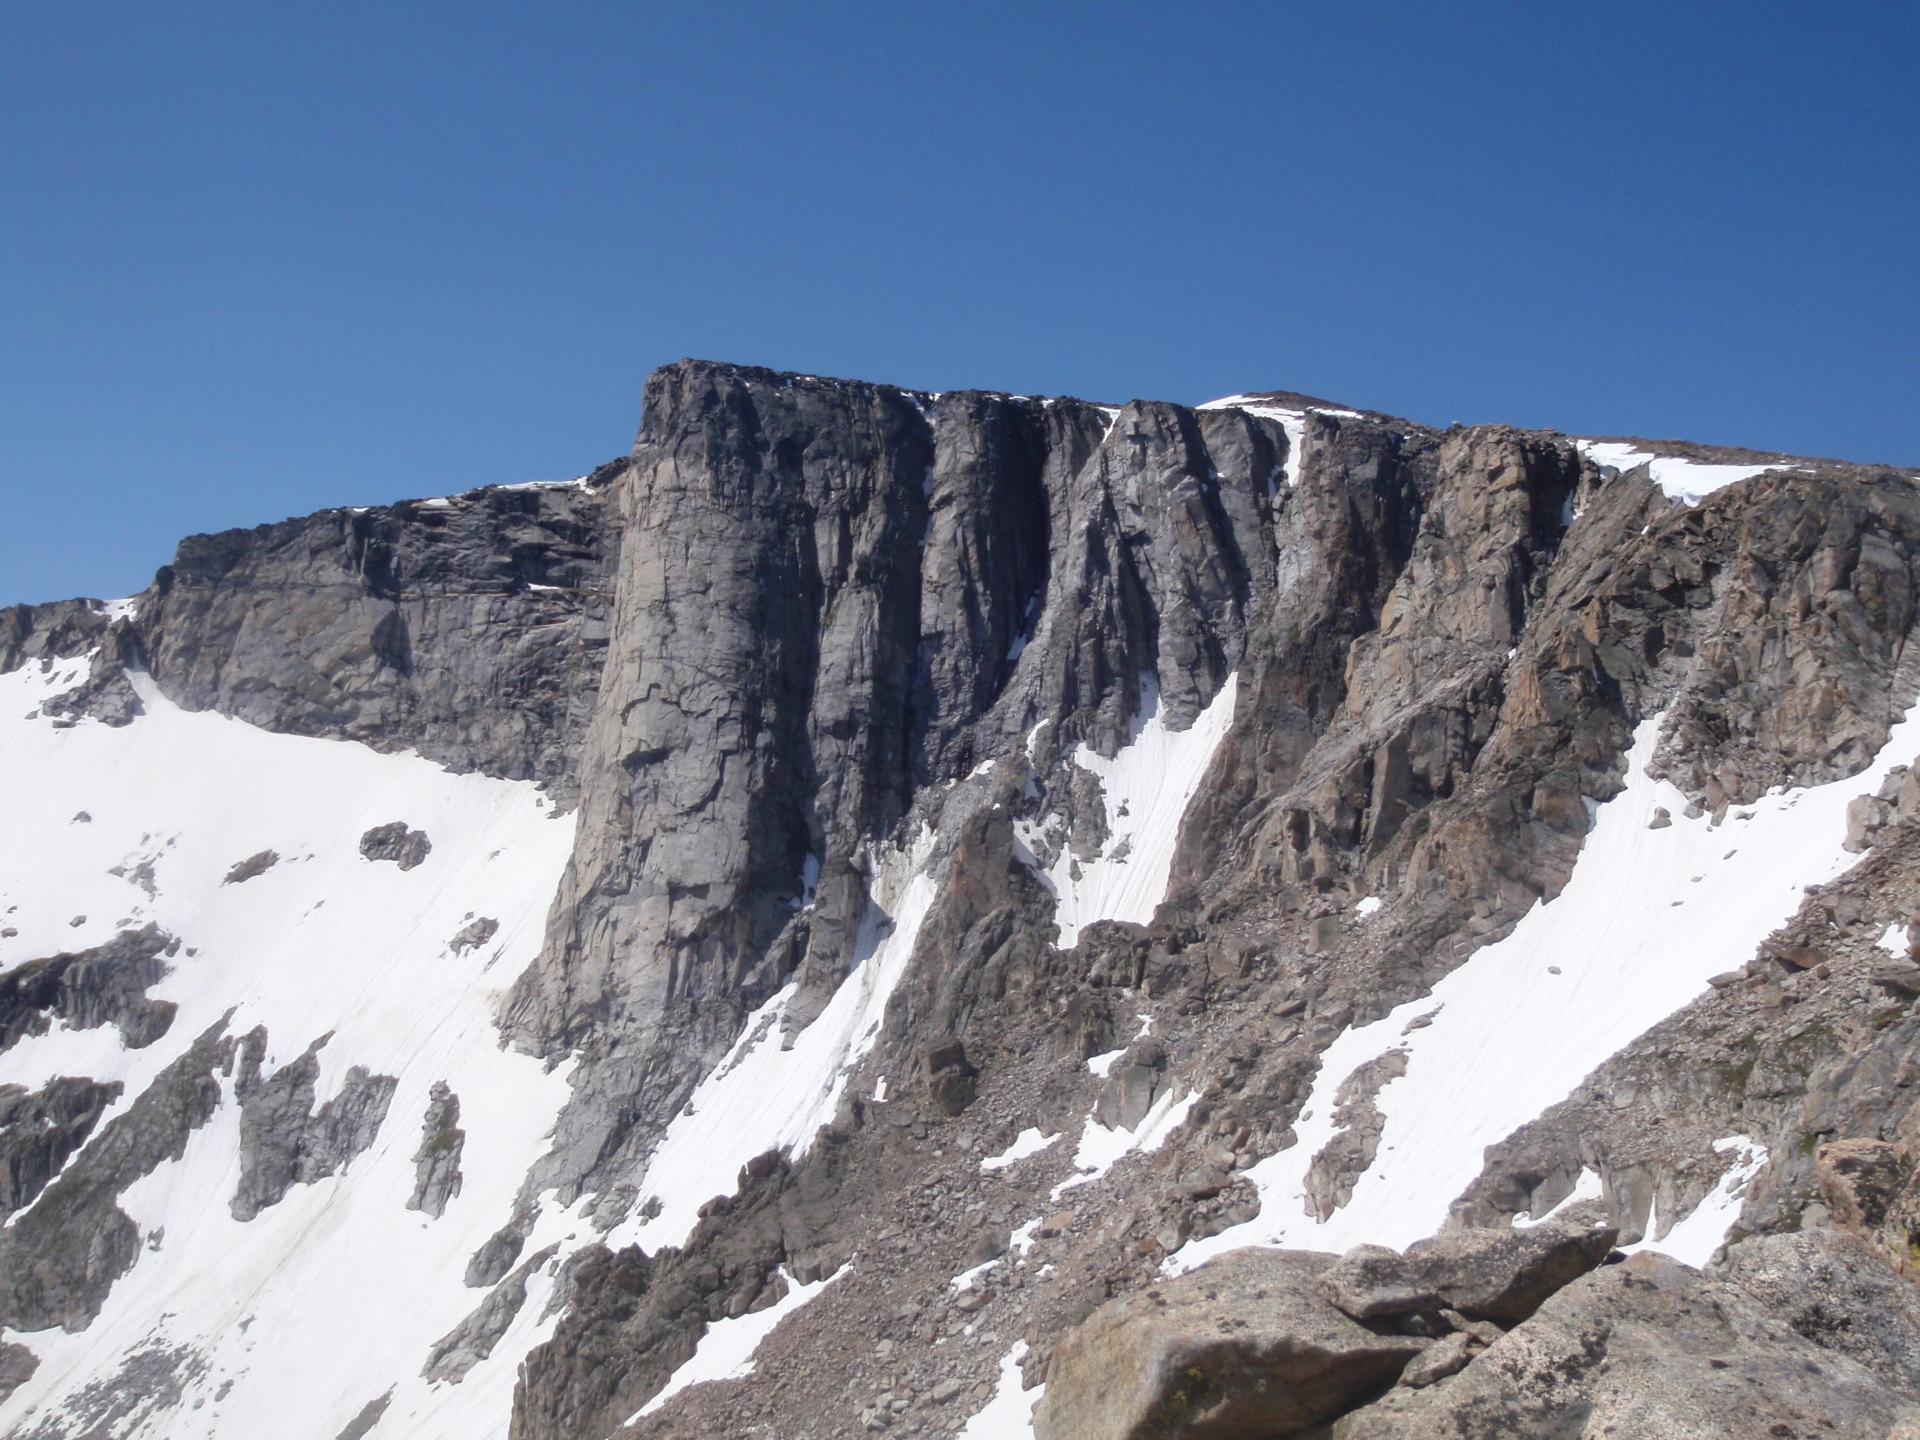 6. Silver Run Peak